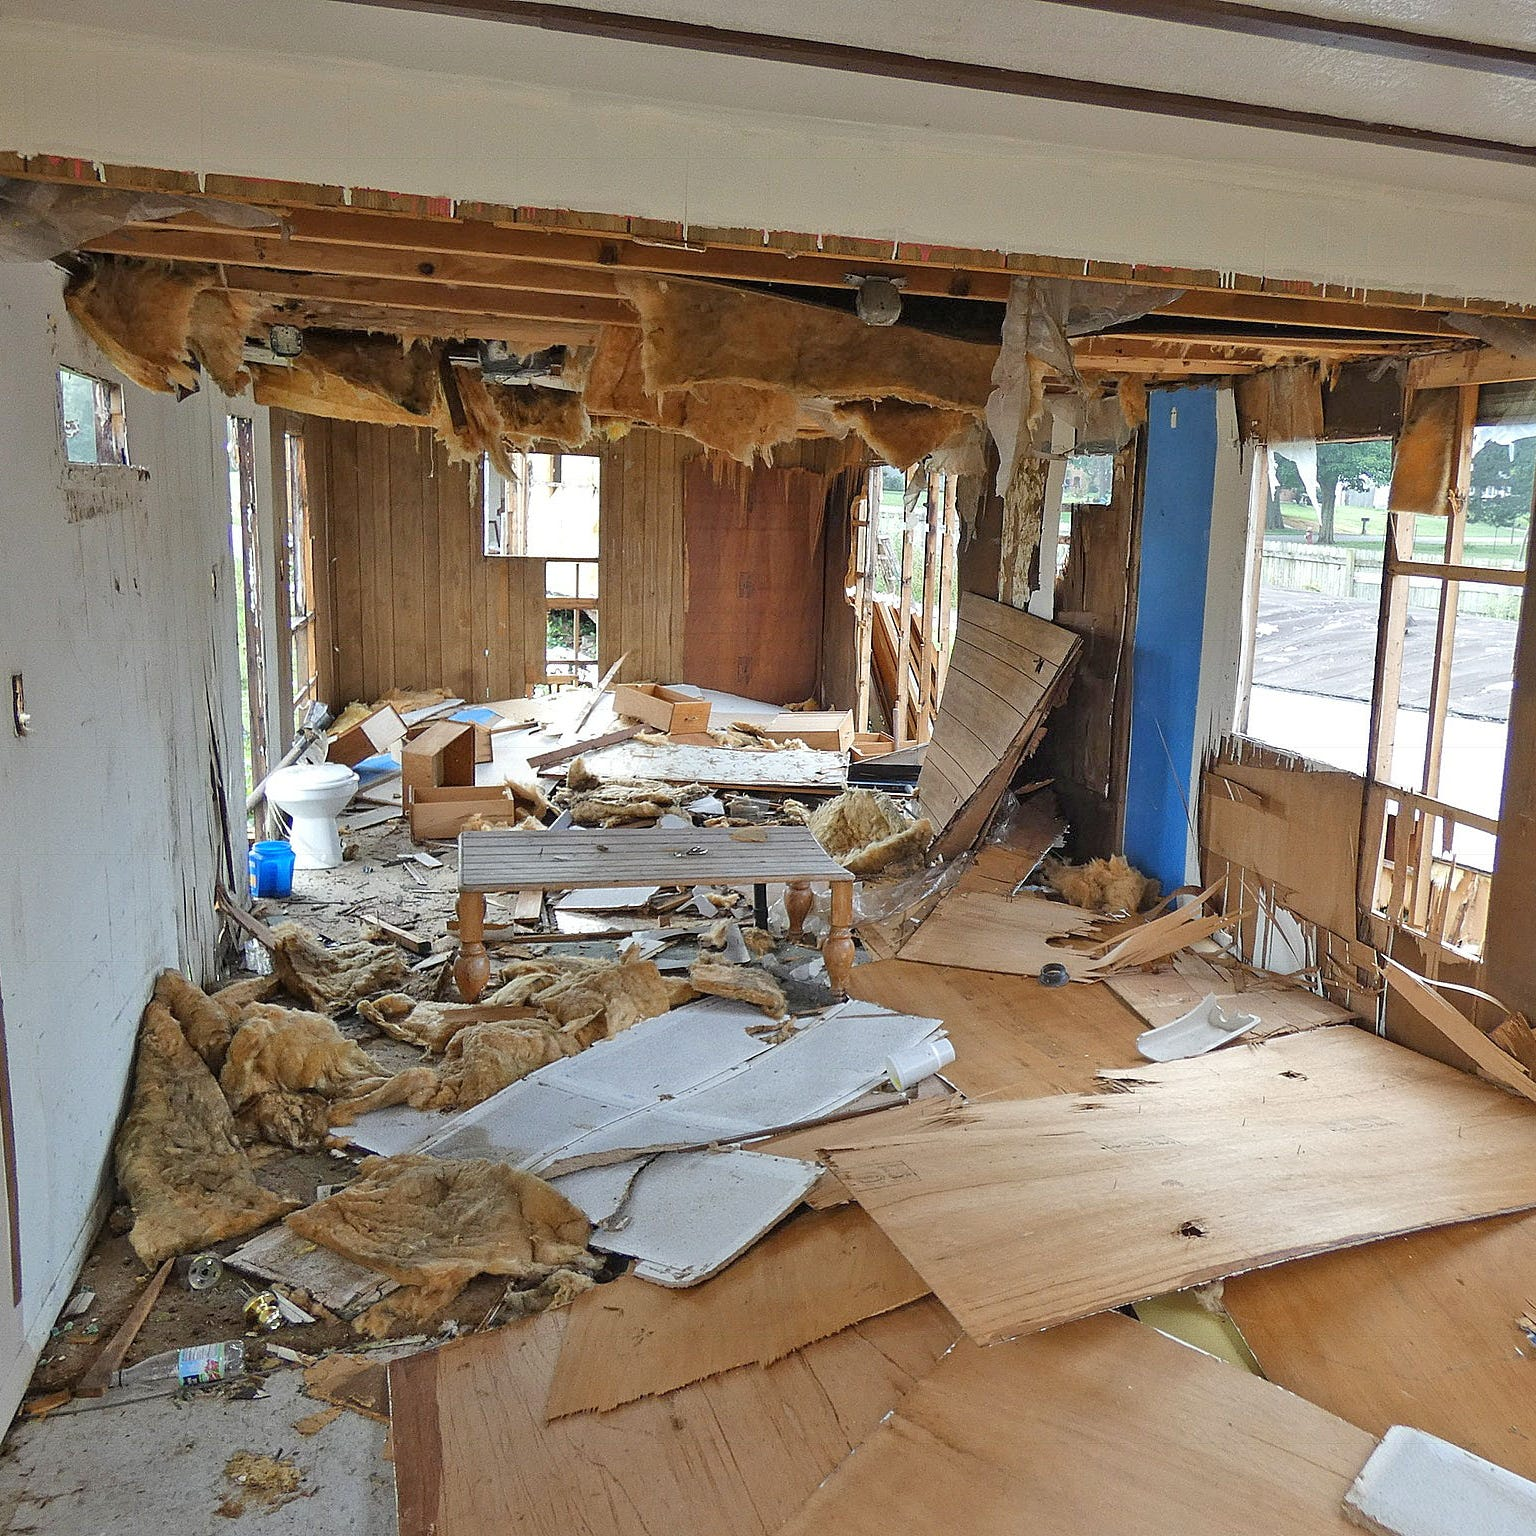 McFarland's Mobile Home Park being demolished